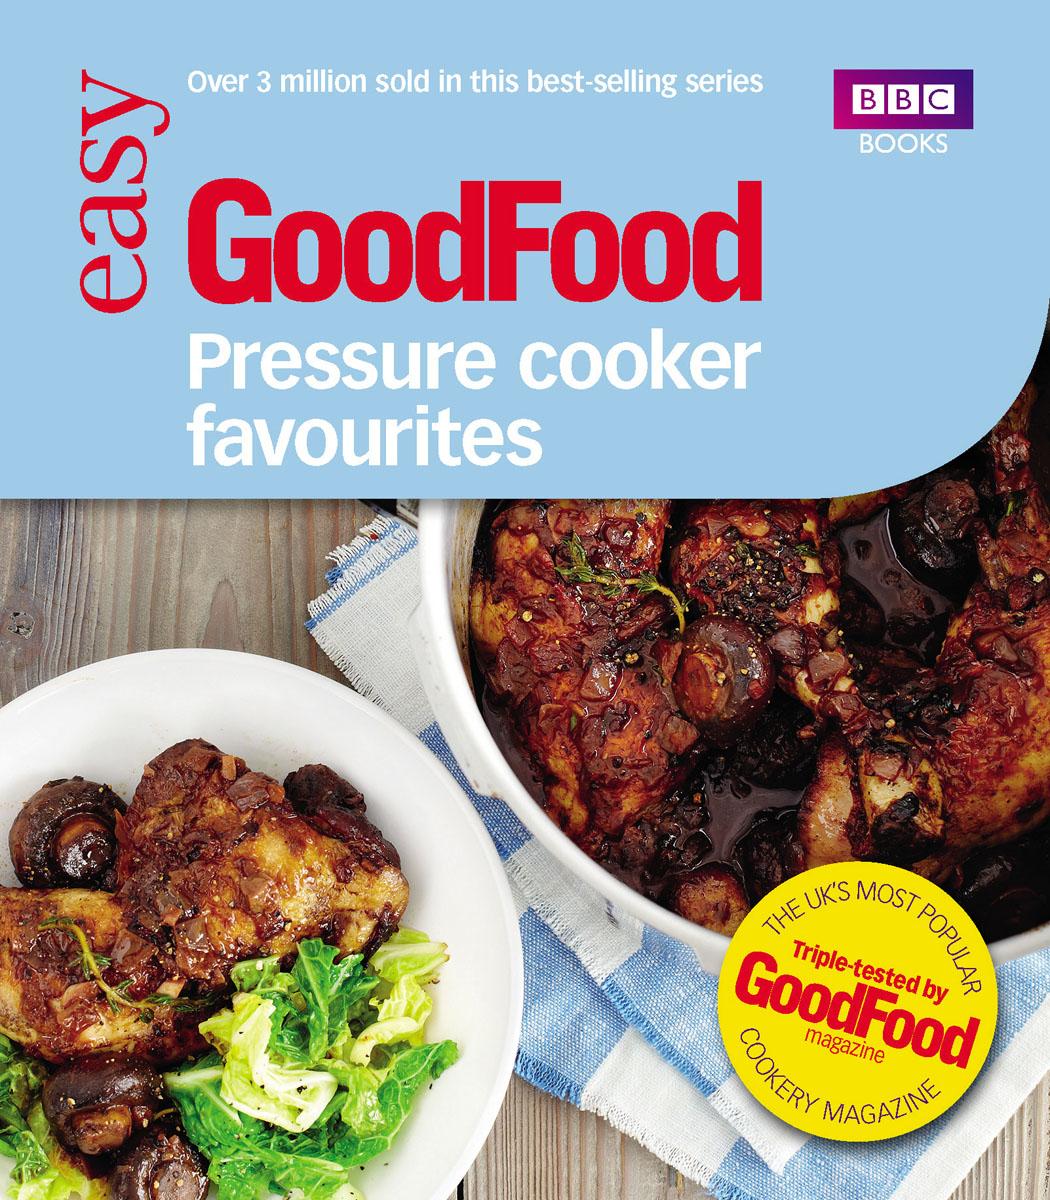 Desmazery, Barney. Good Food: Pressure Cooker Favourites